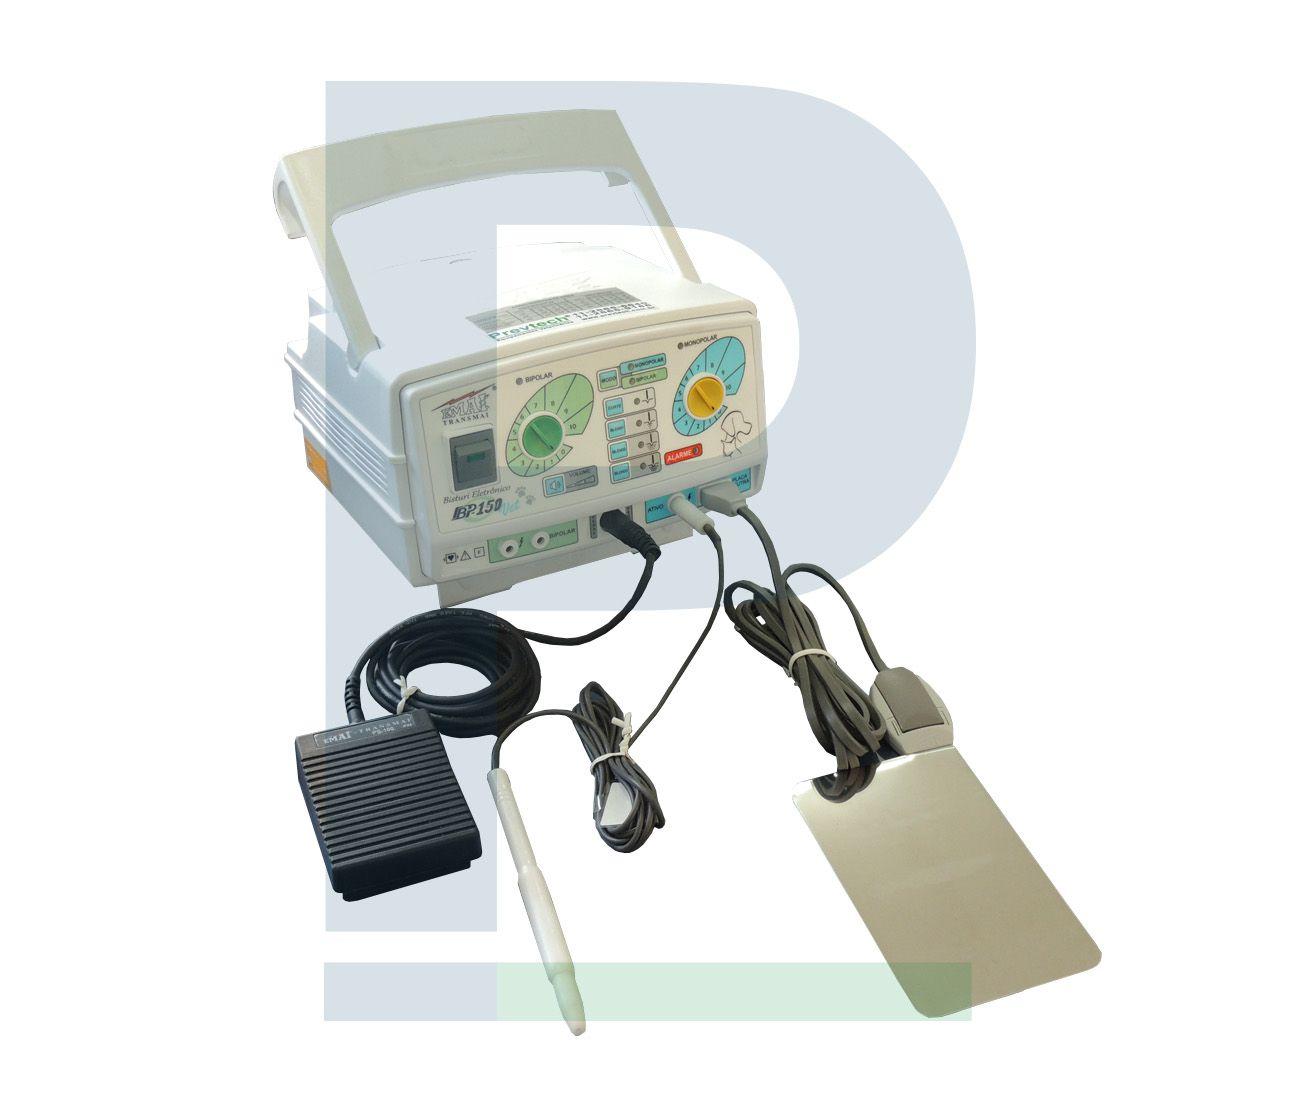 Bisturi Eletrônico Veterinário BP150 Digital